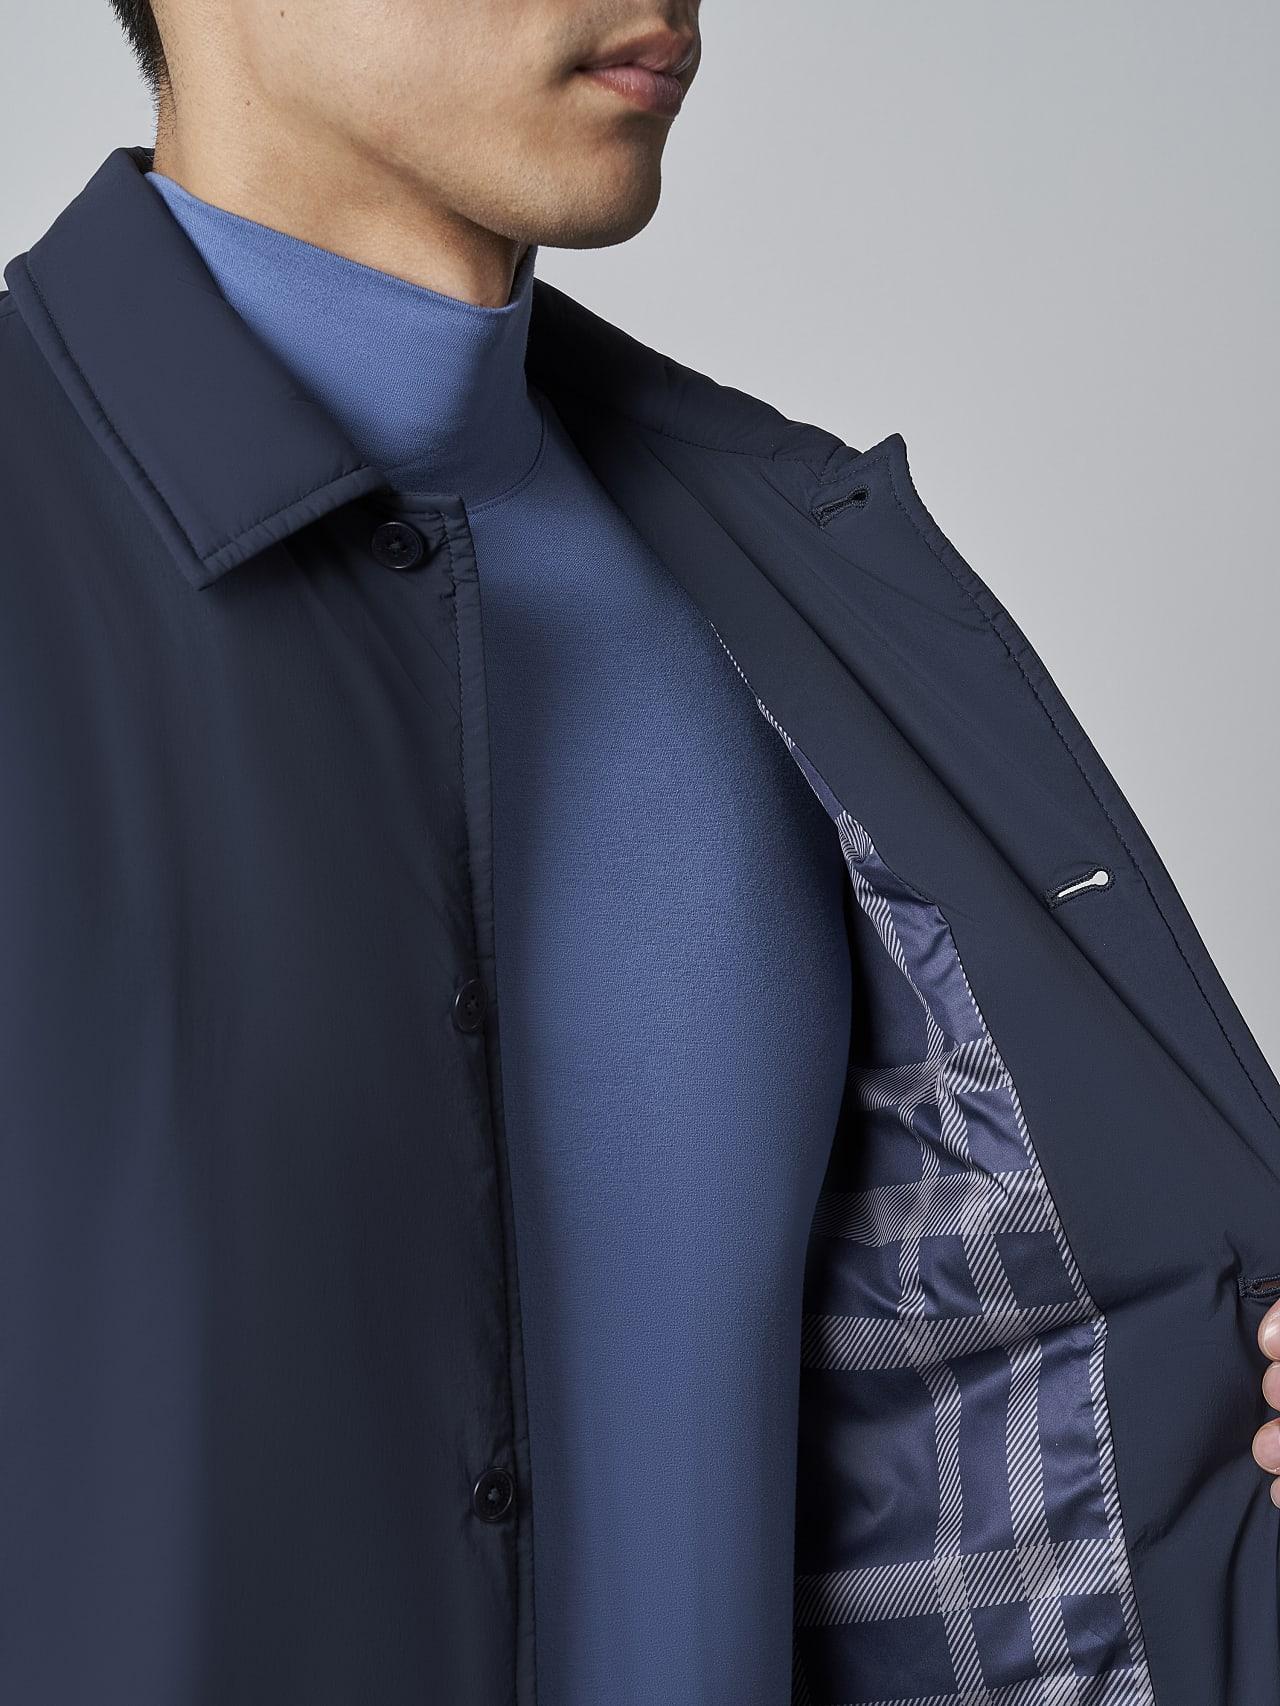 OVASU V1.Y5.02 PrimaLoft® Overshirt Jacket navy scene7.view.8.name Alpha Tauri